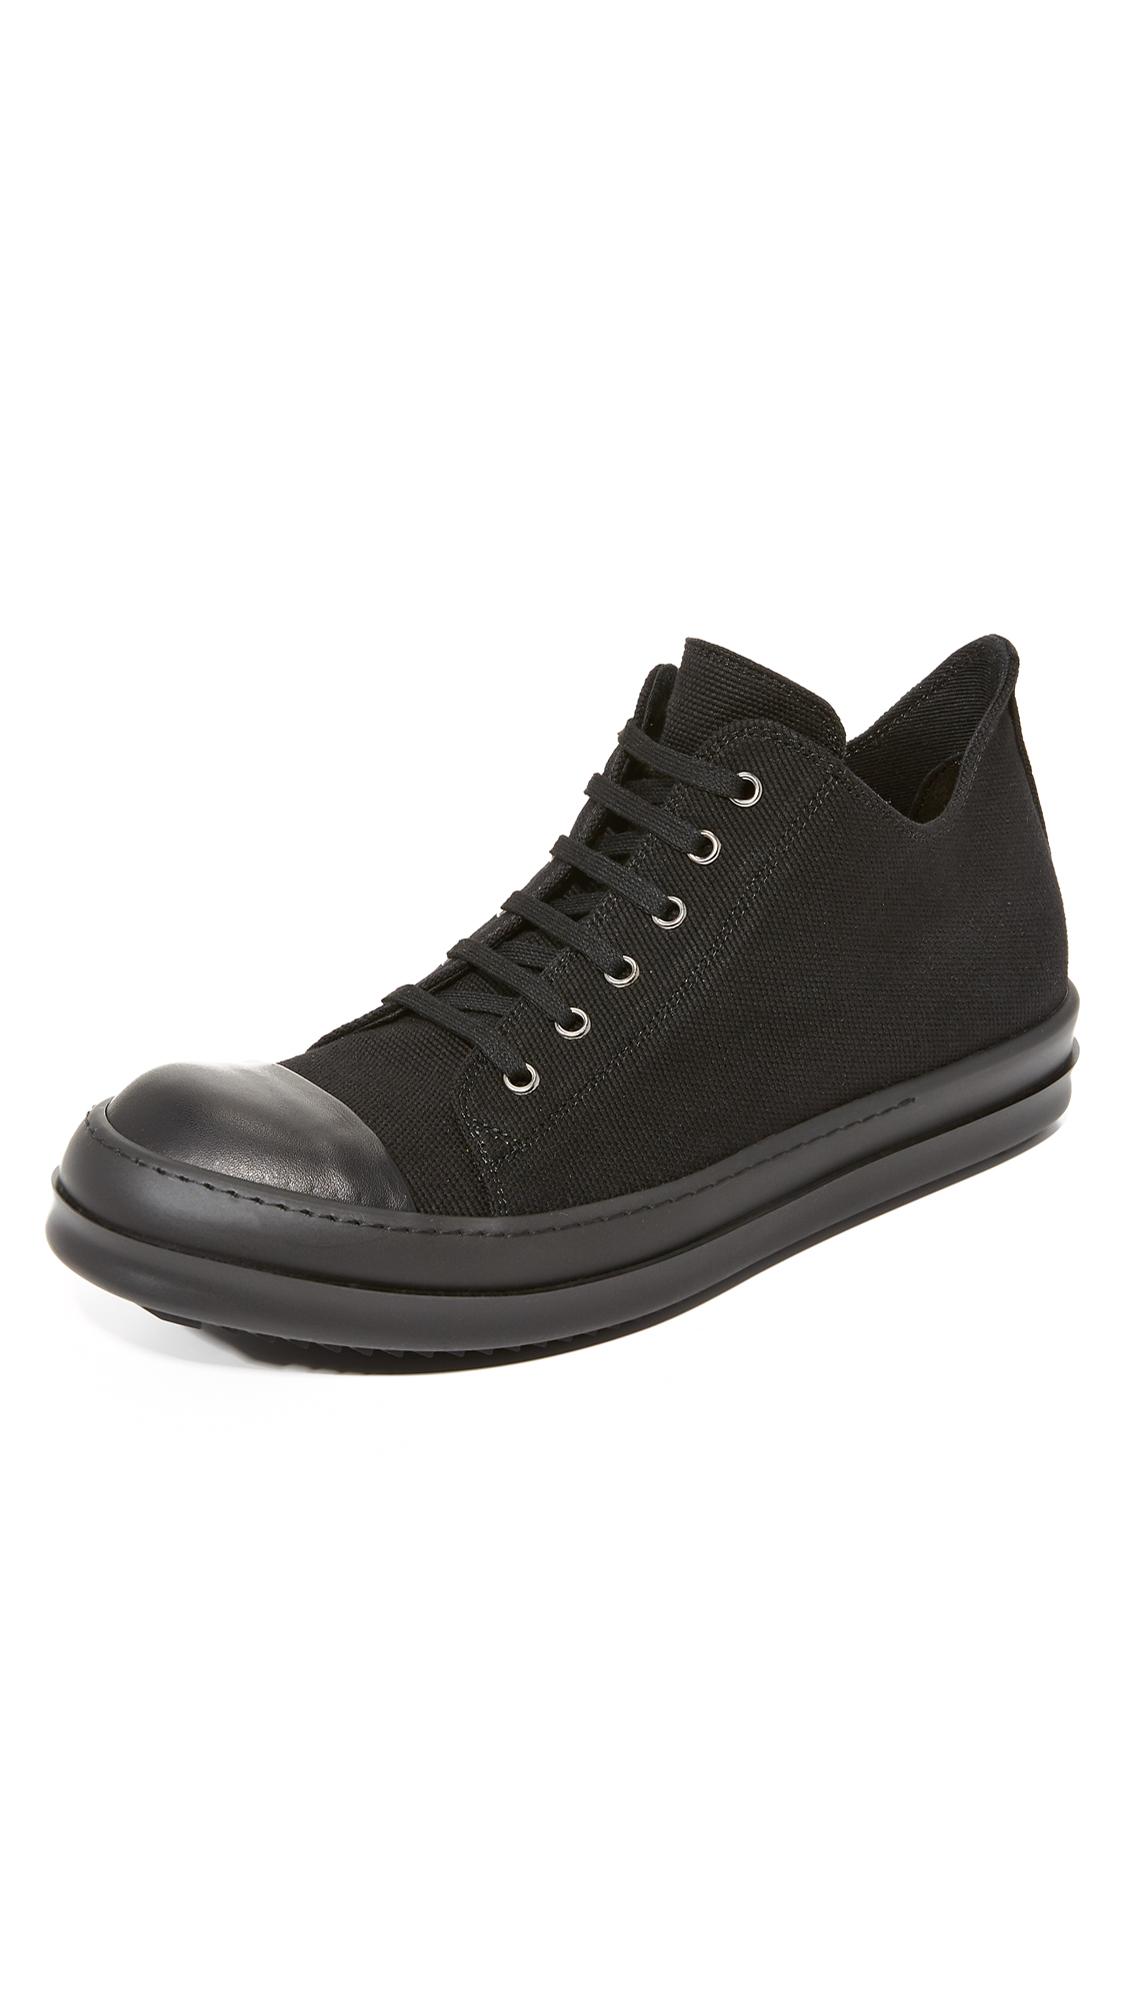 RICK OWENS DRKSHDW Lace-Up Sneakers in Black